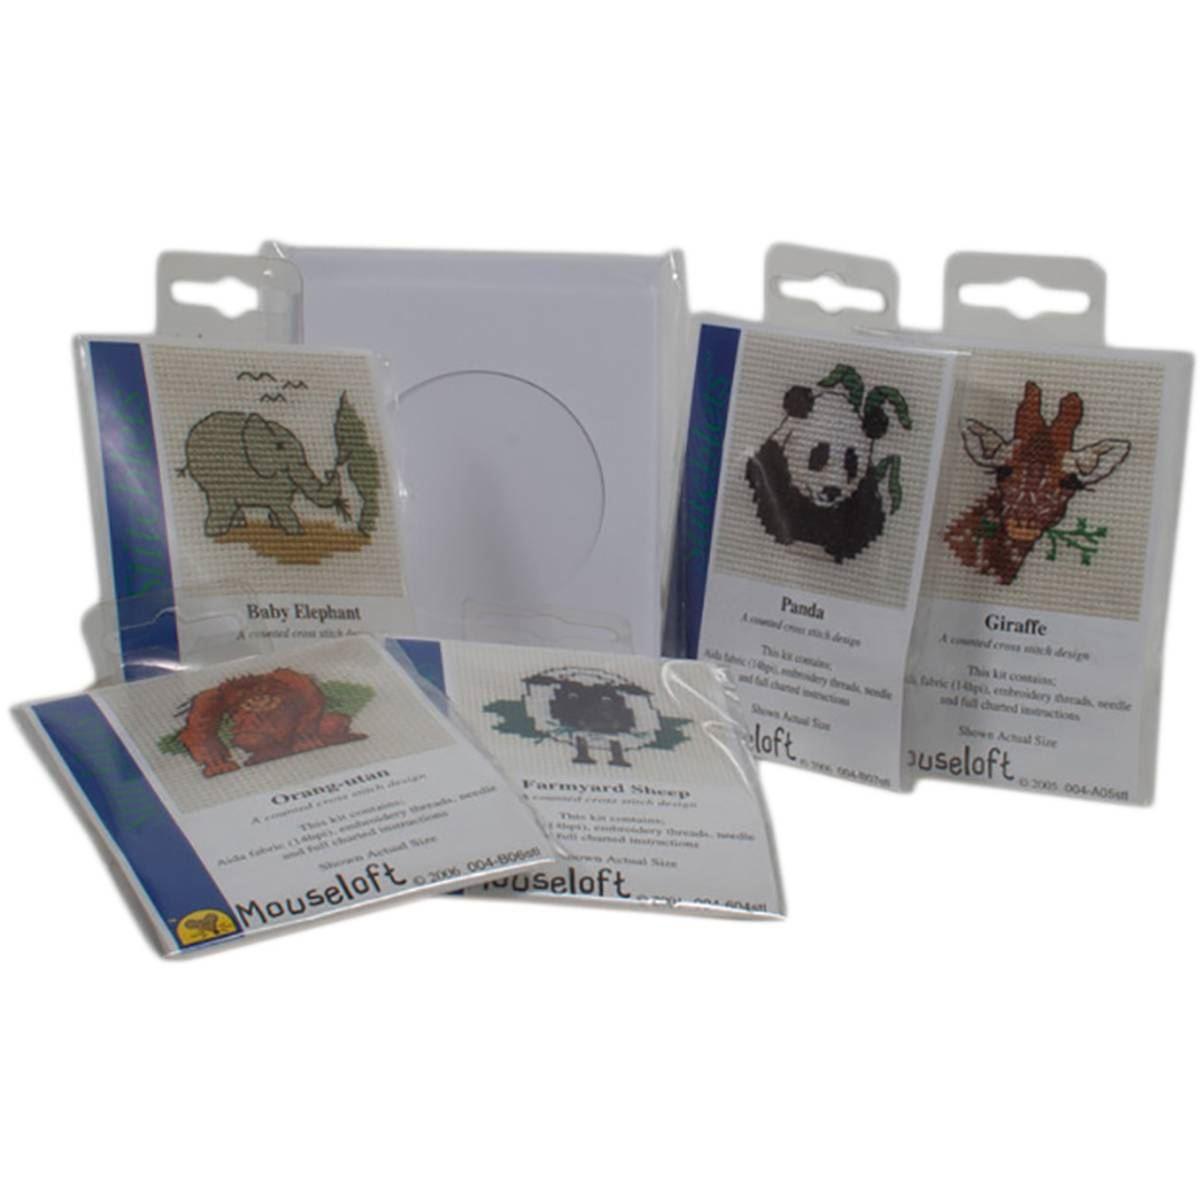 mouseloft stitchlets mini cross stitch kits and trifold